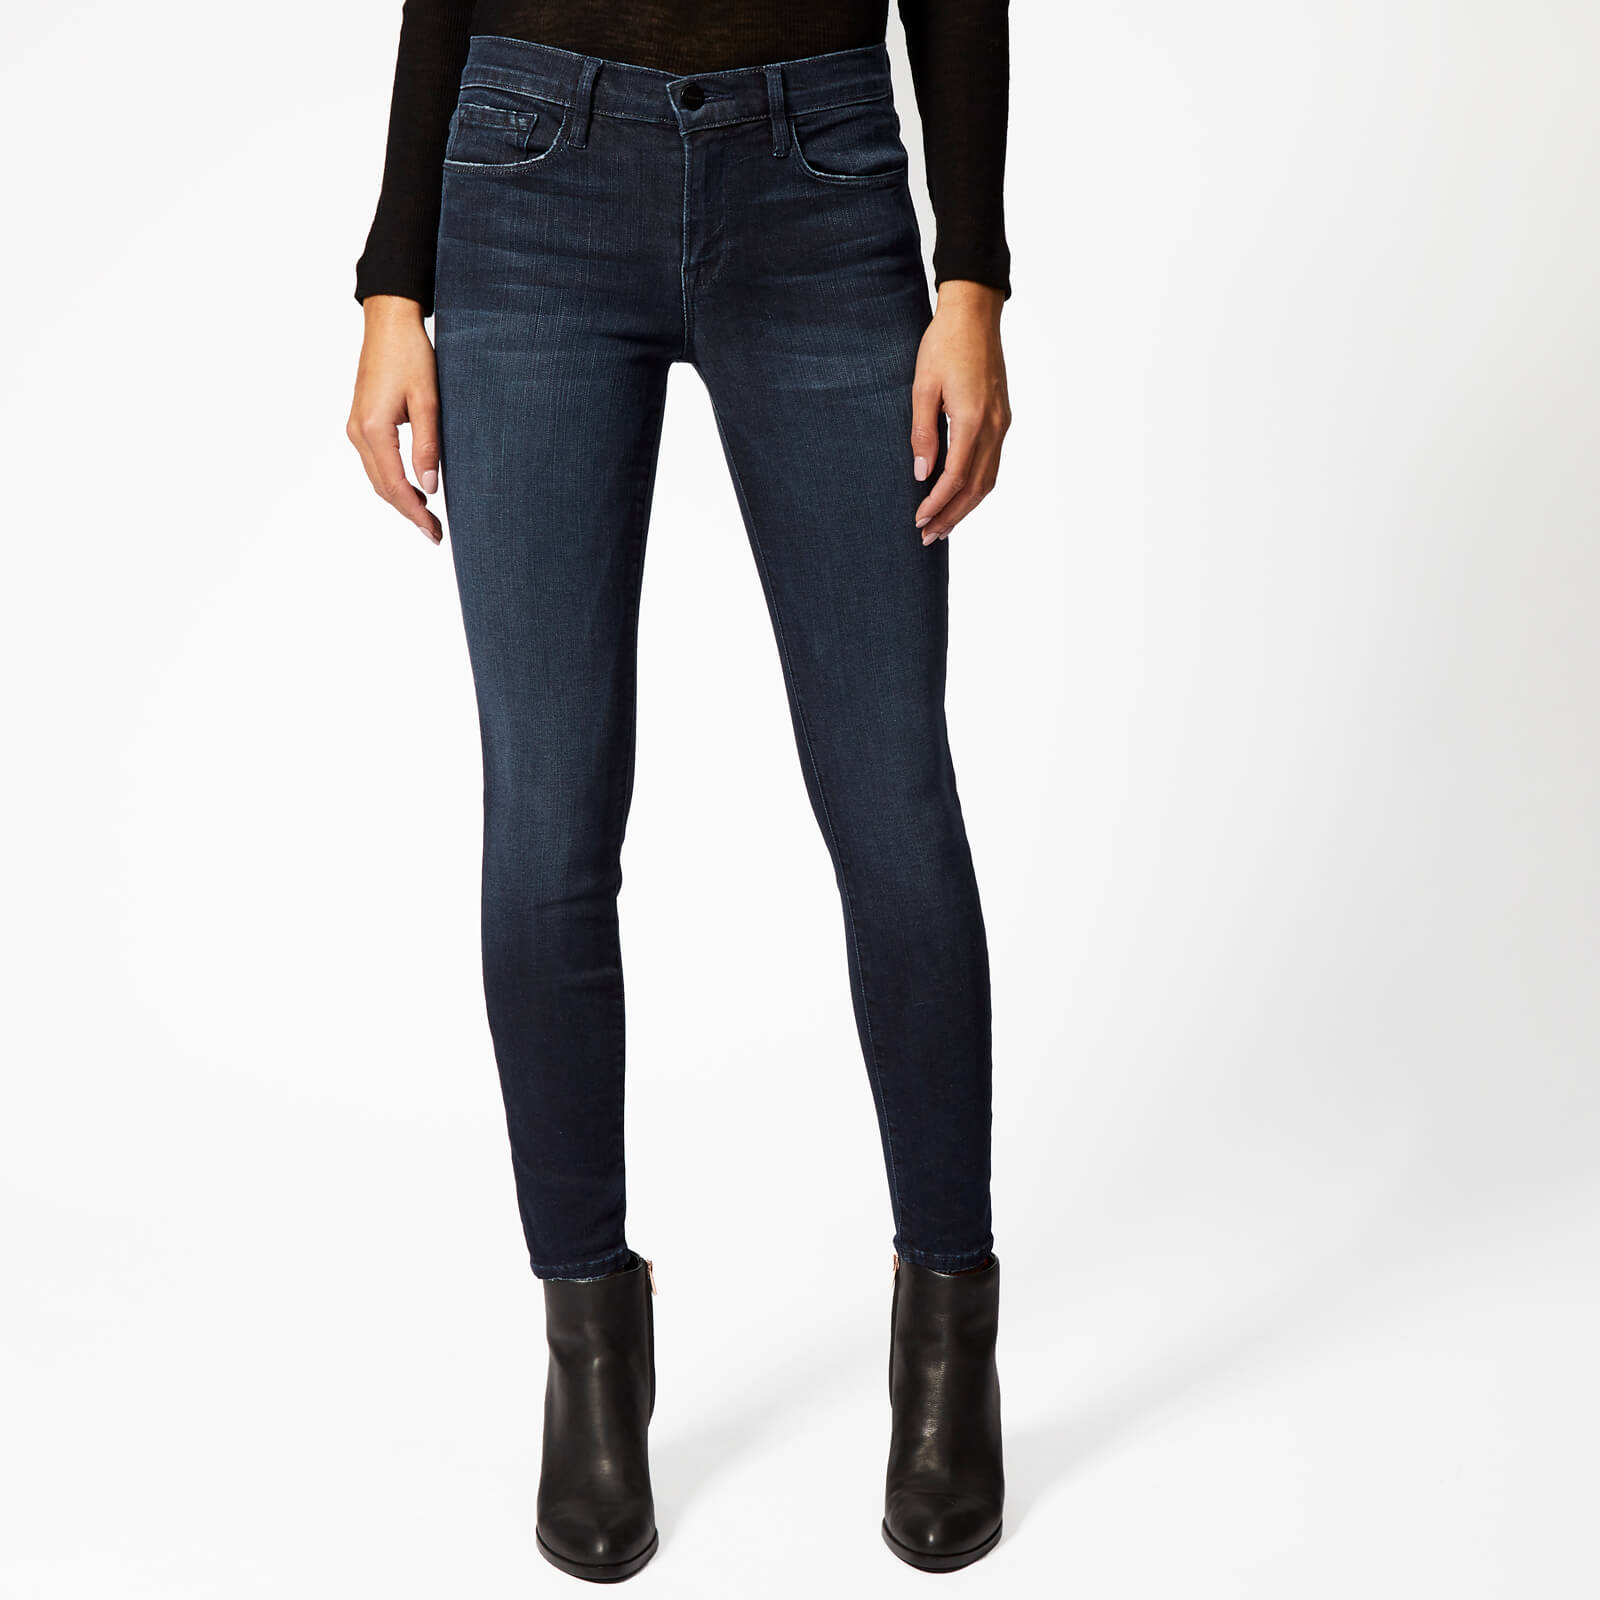 cd3656f72752 Frame Women s Le Skinny de Jeanne Crop Jeans - St. Jones - Free UK Delivery  over £50